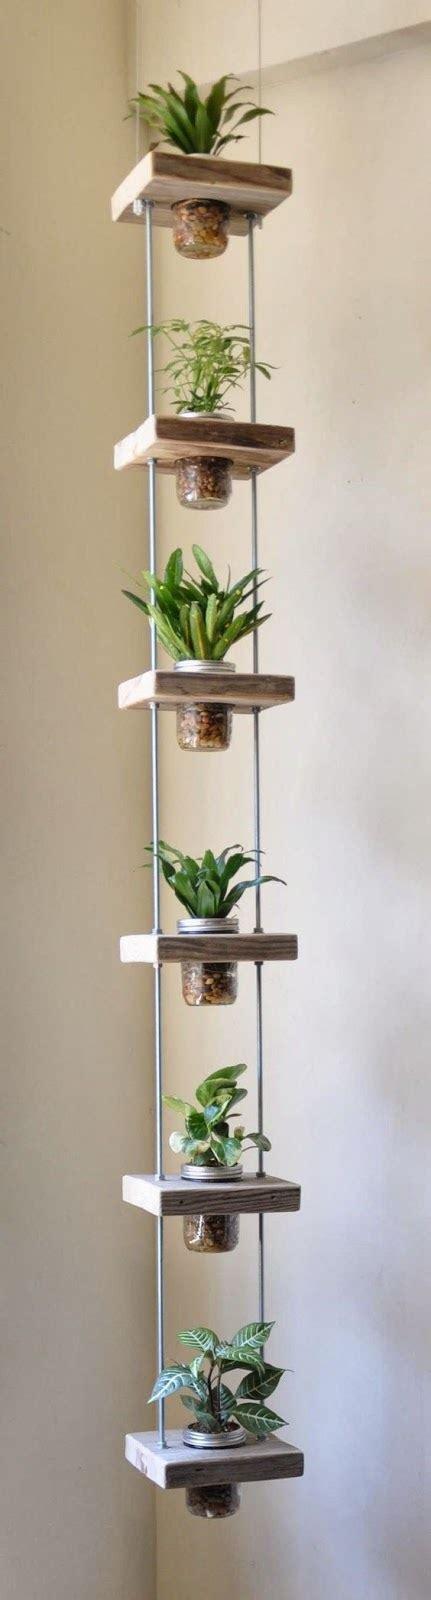 inspiring diy beaming plant shelves ideas